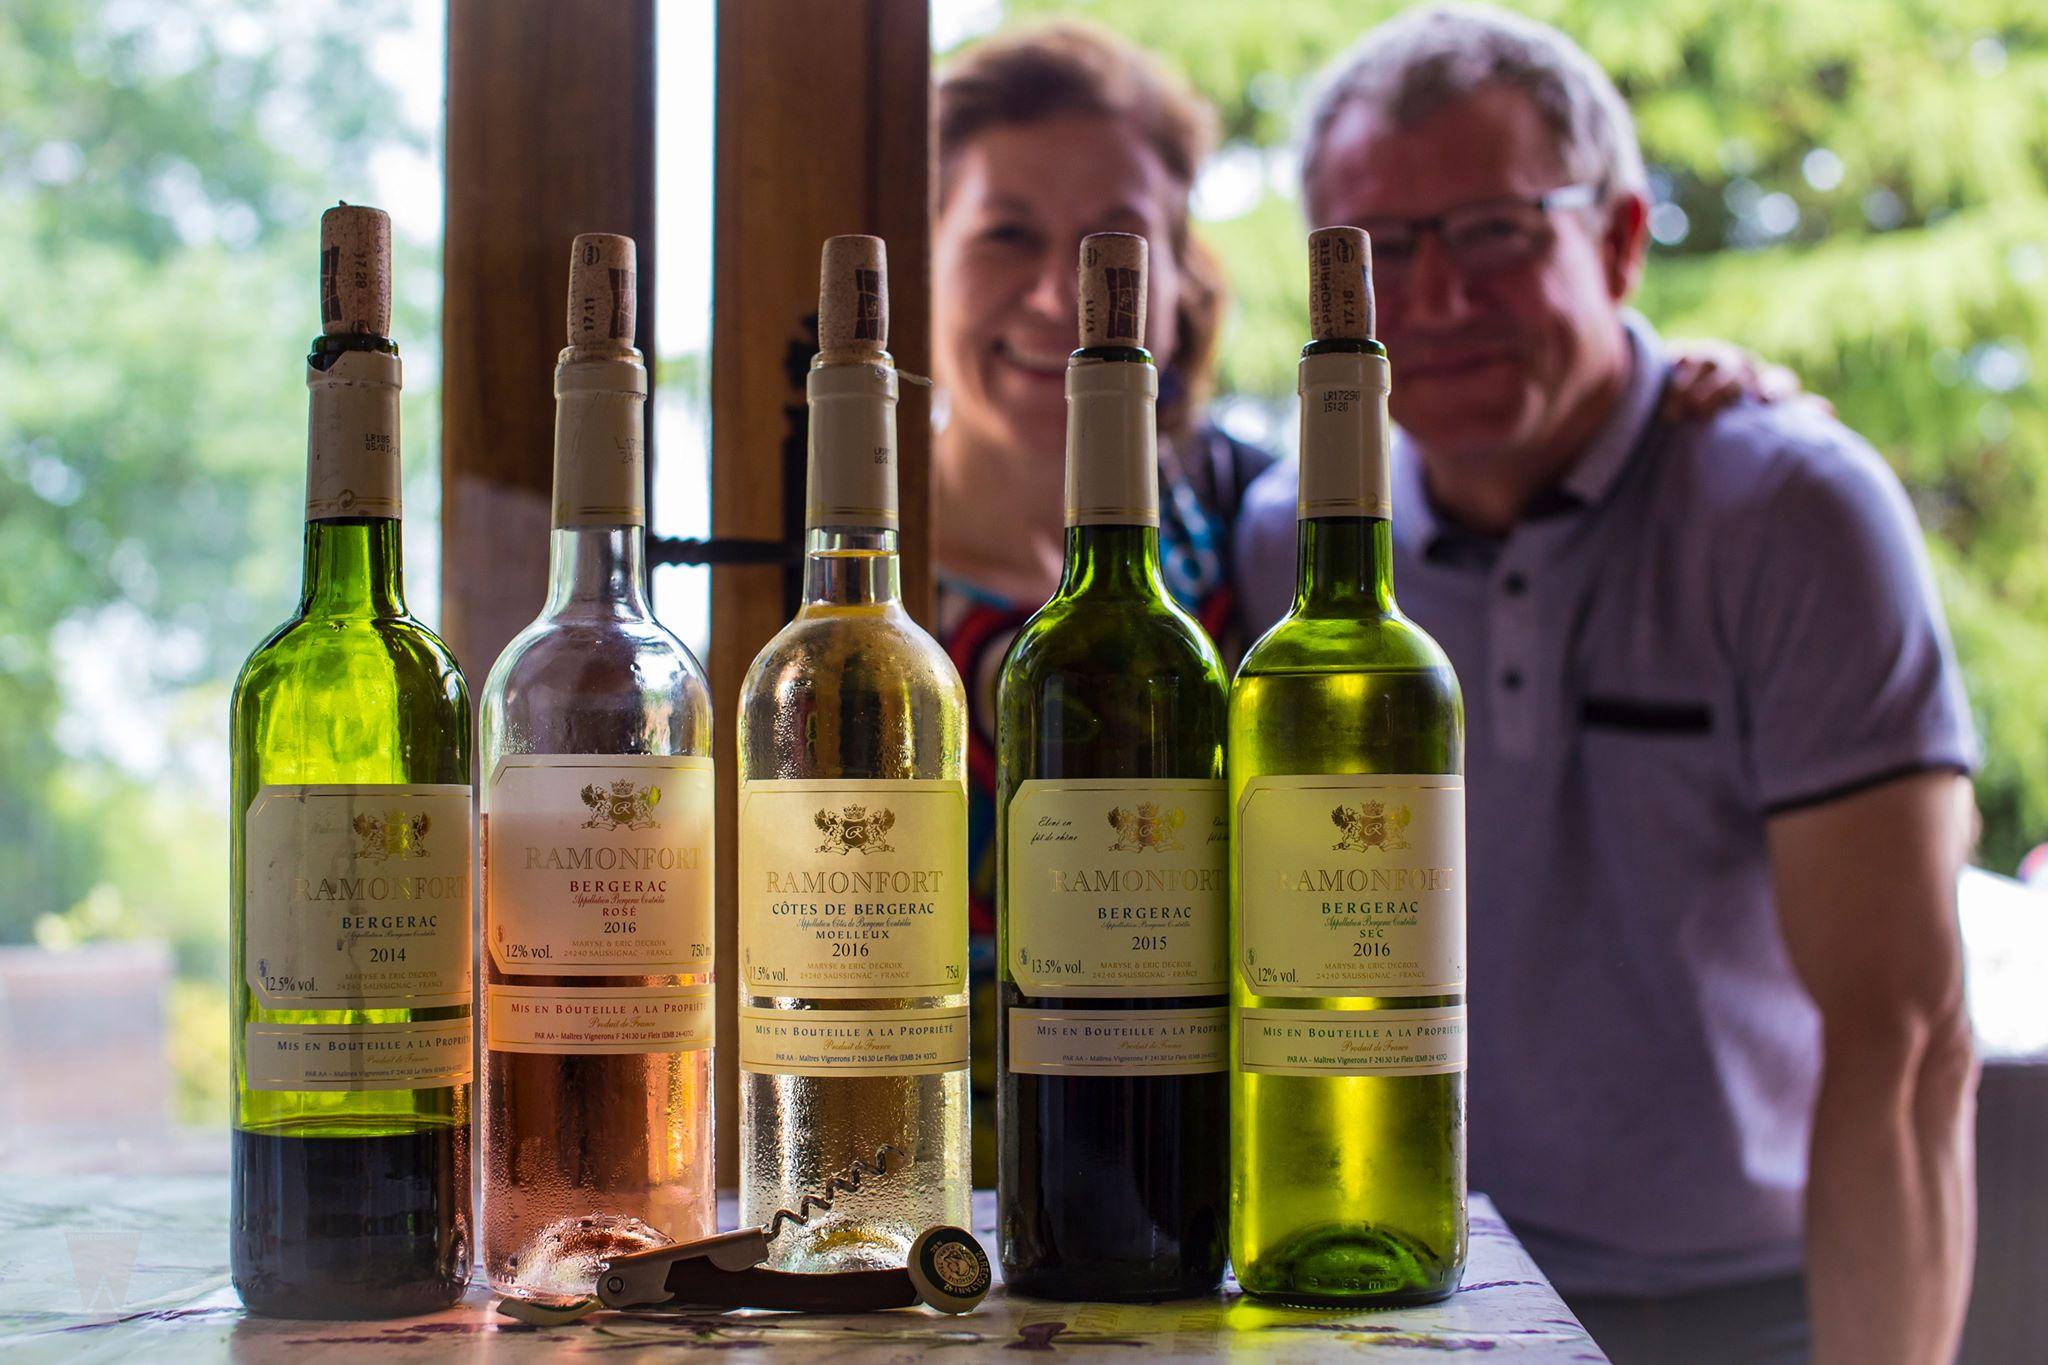 Wines_of_Ramonfort_2